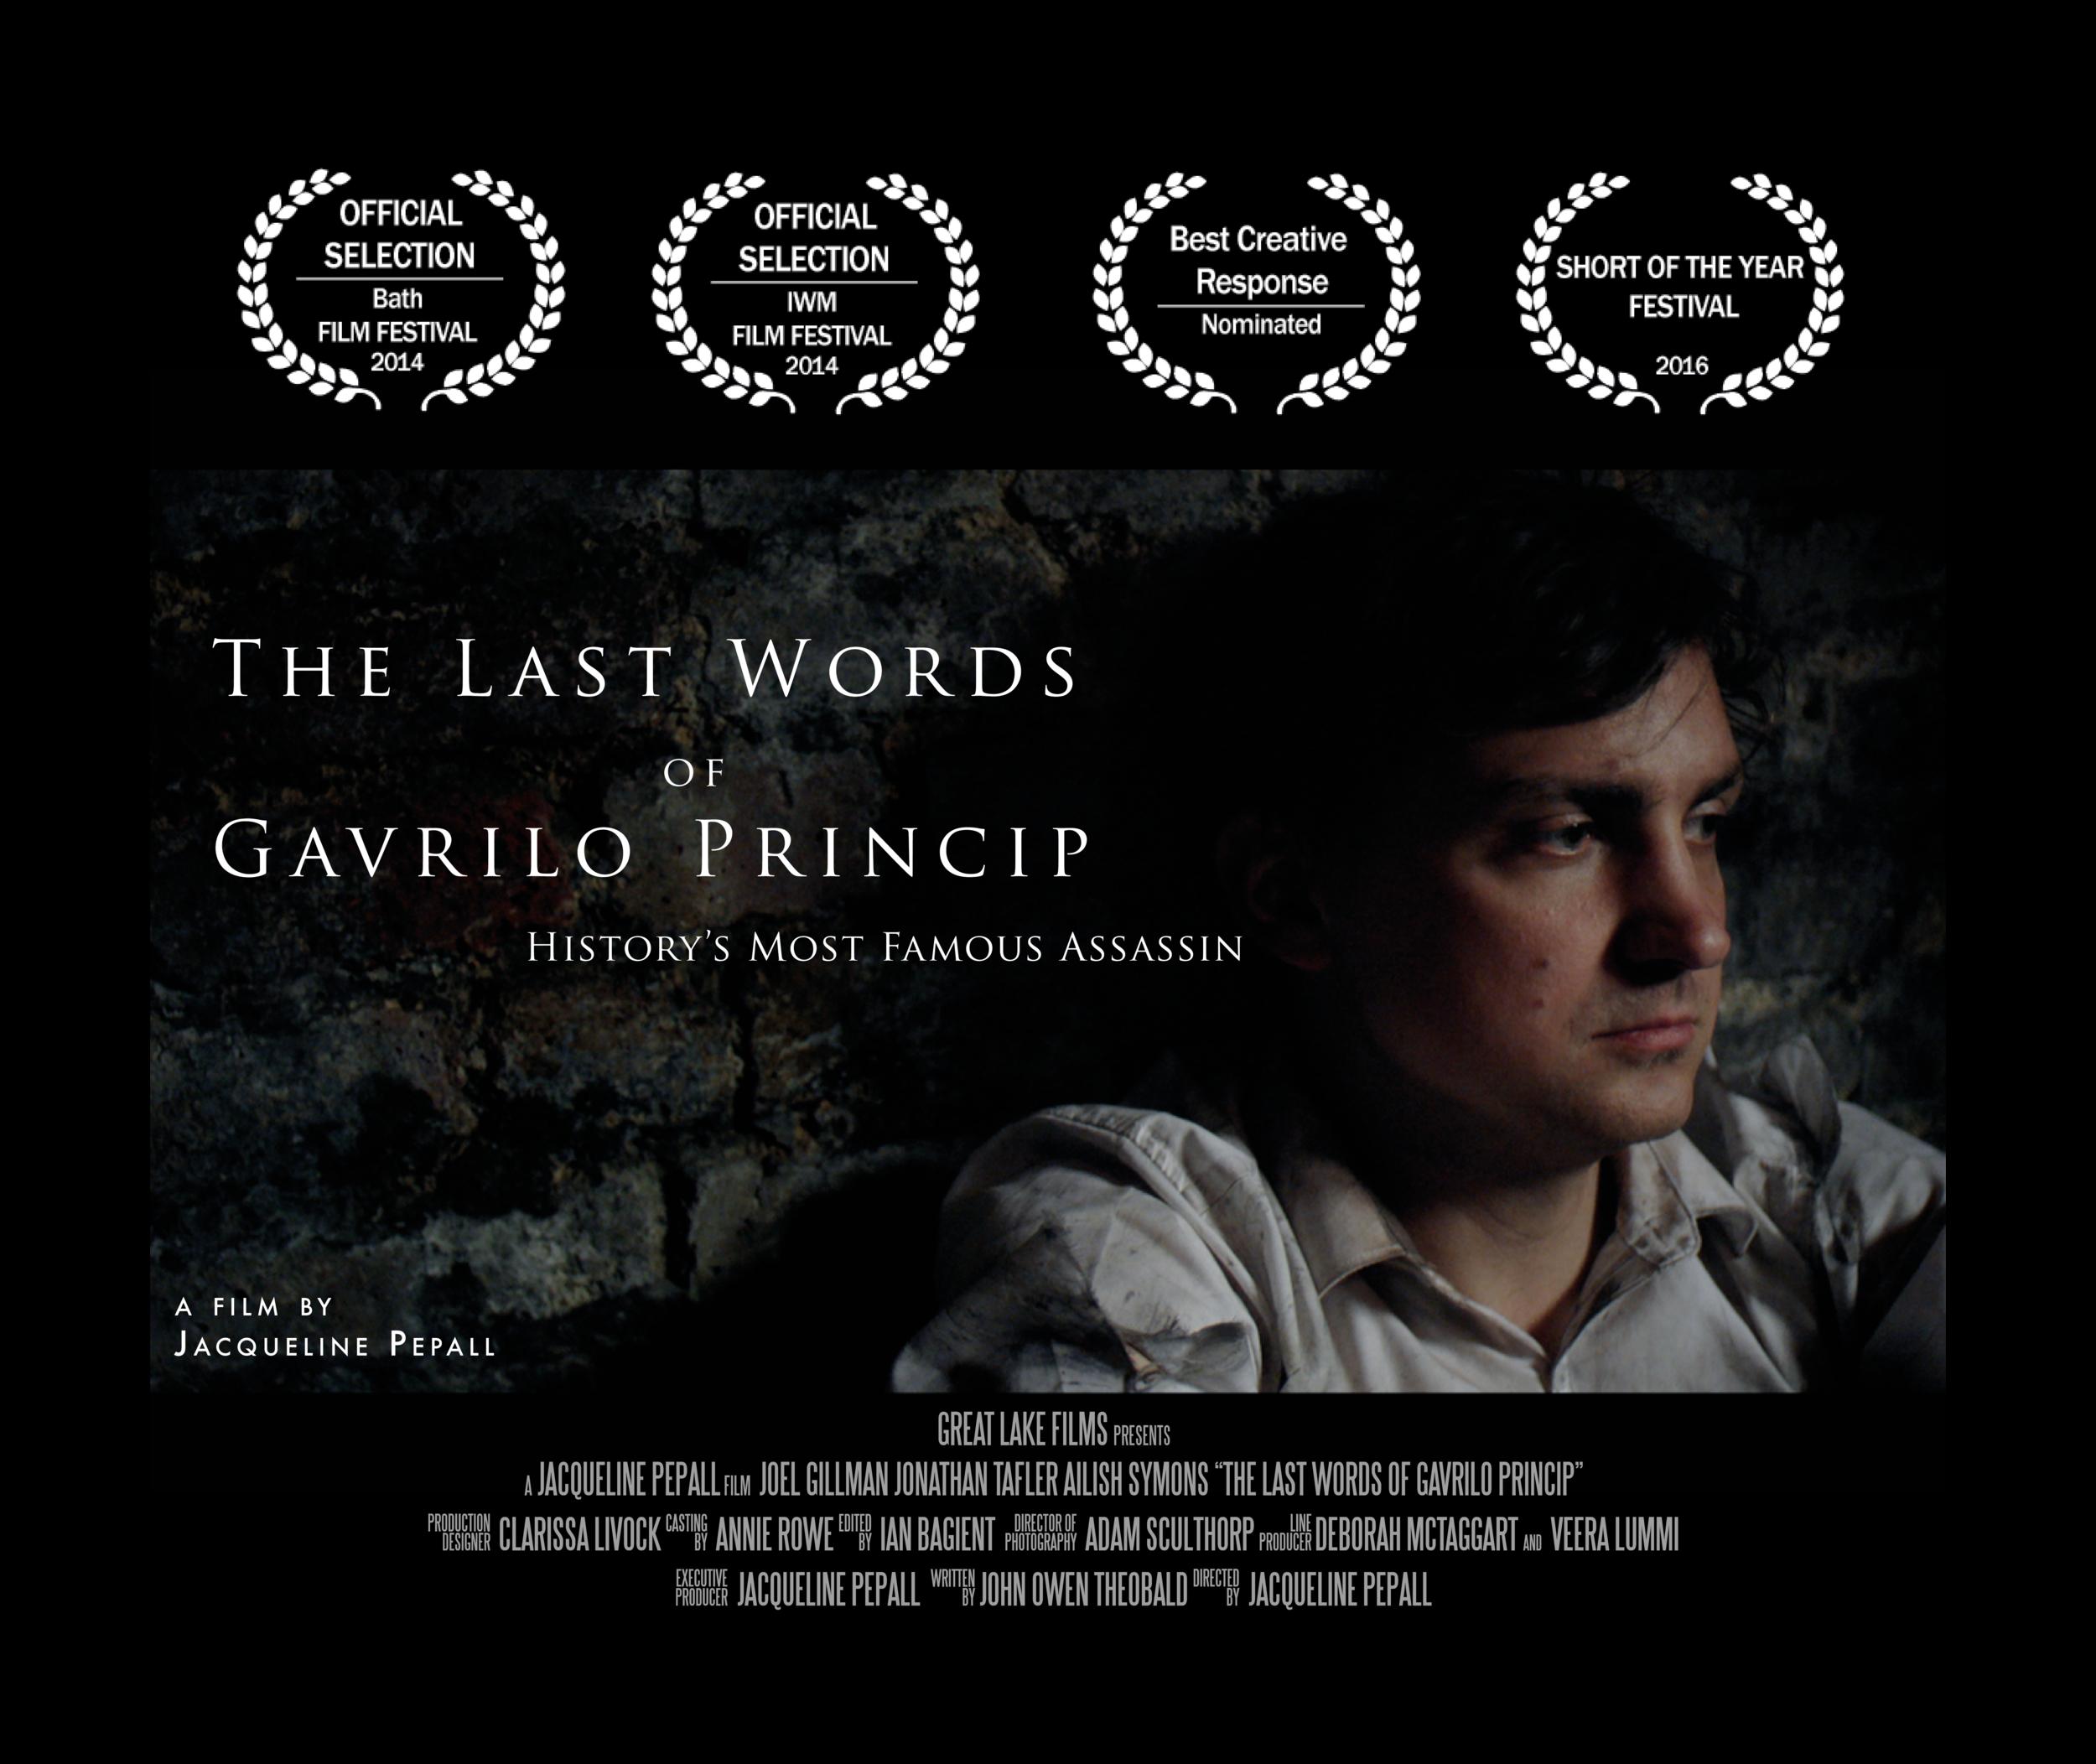 The Last Words of Gavrilo Princip